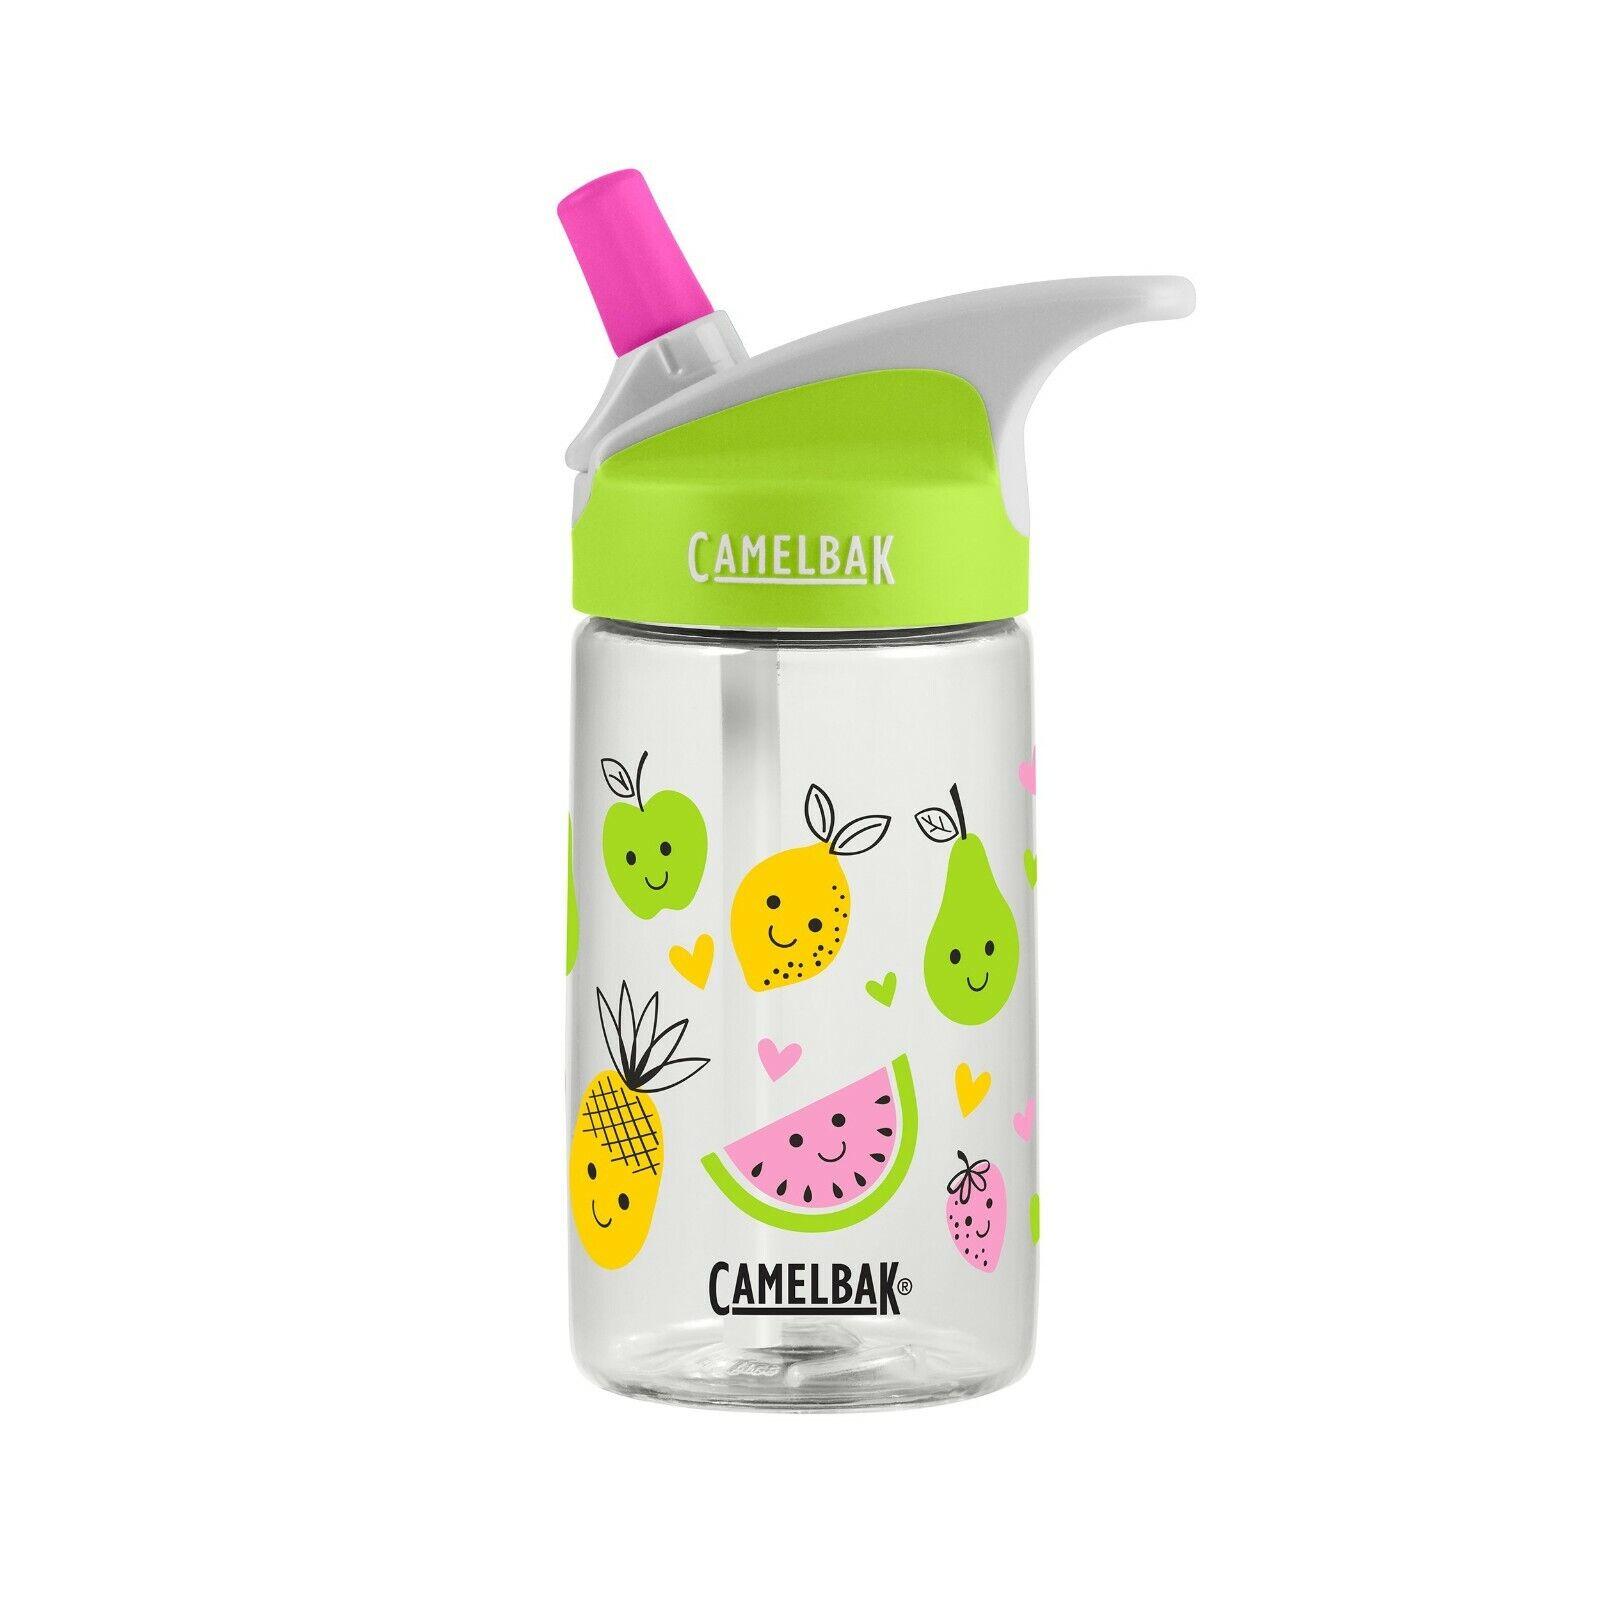 Camelbak Eddy Kid's BPA-Free Bottle 12oz  - Cute Fruit